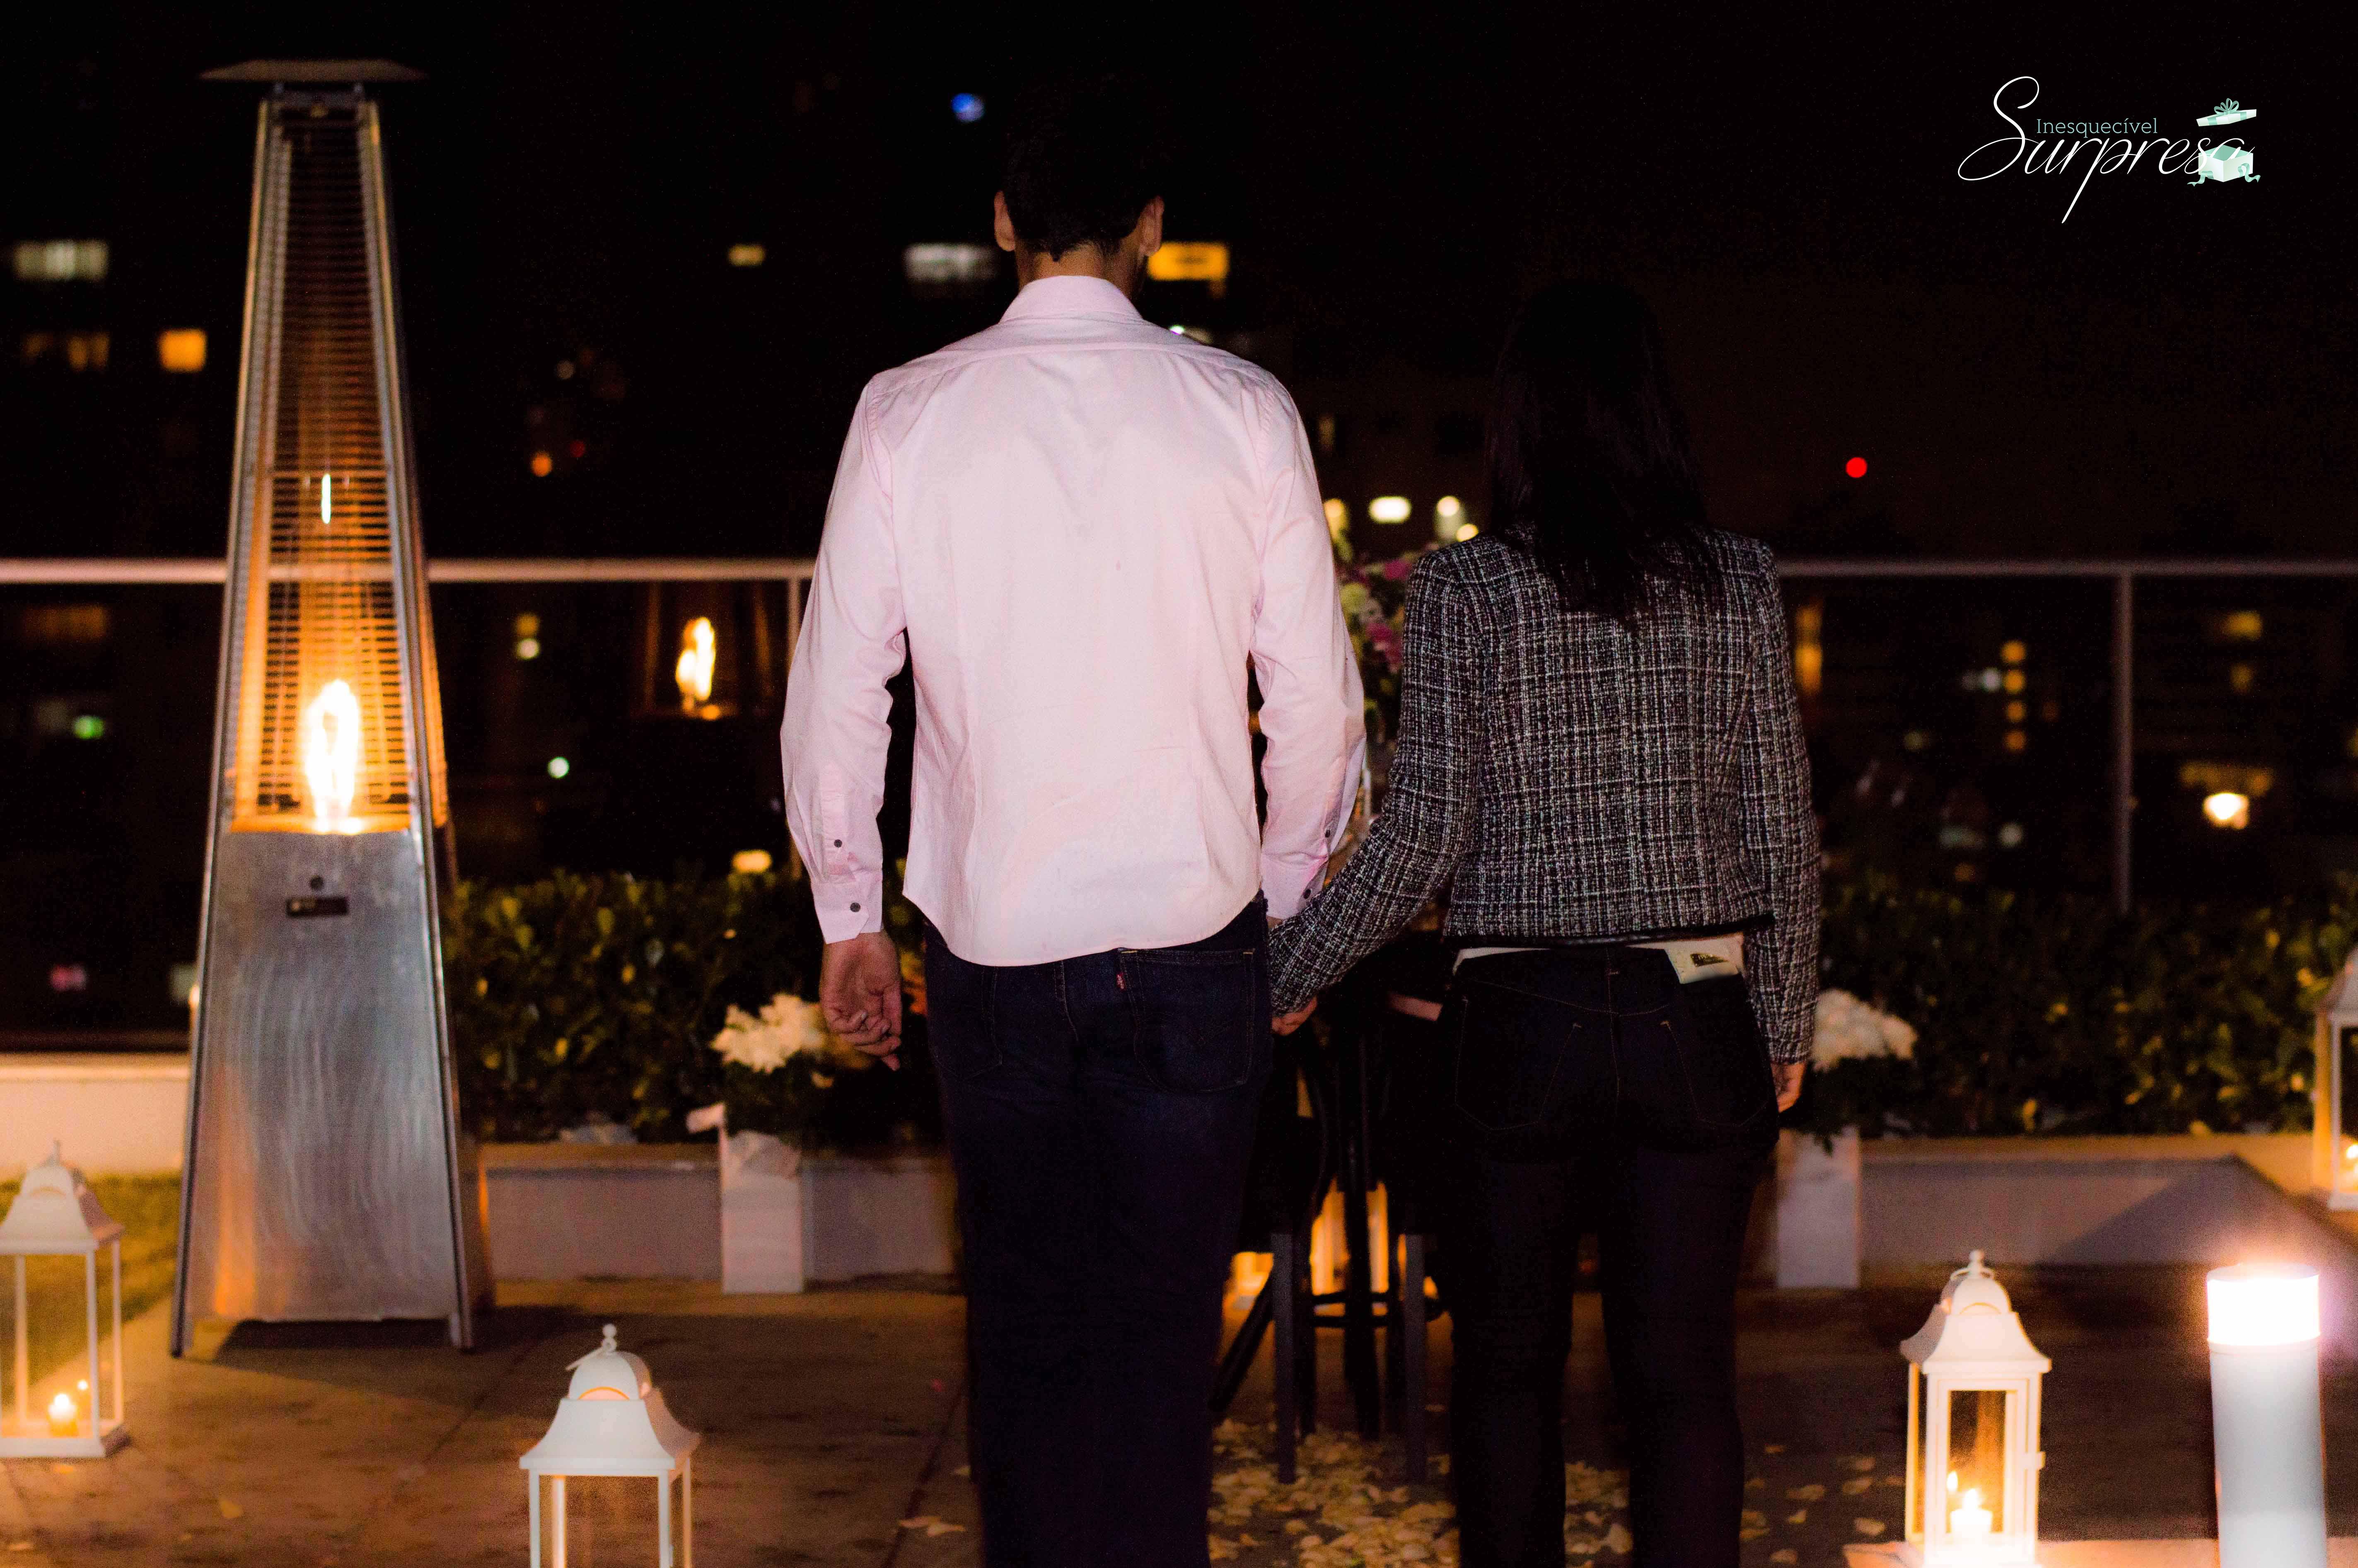 jantar romantico curitiba